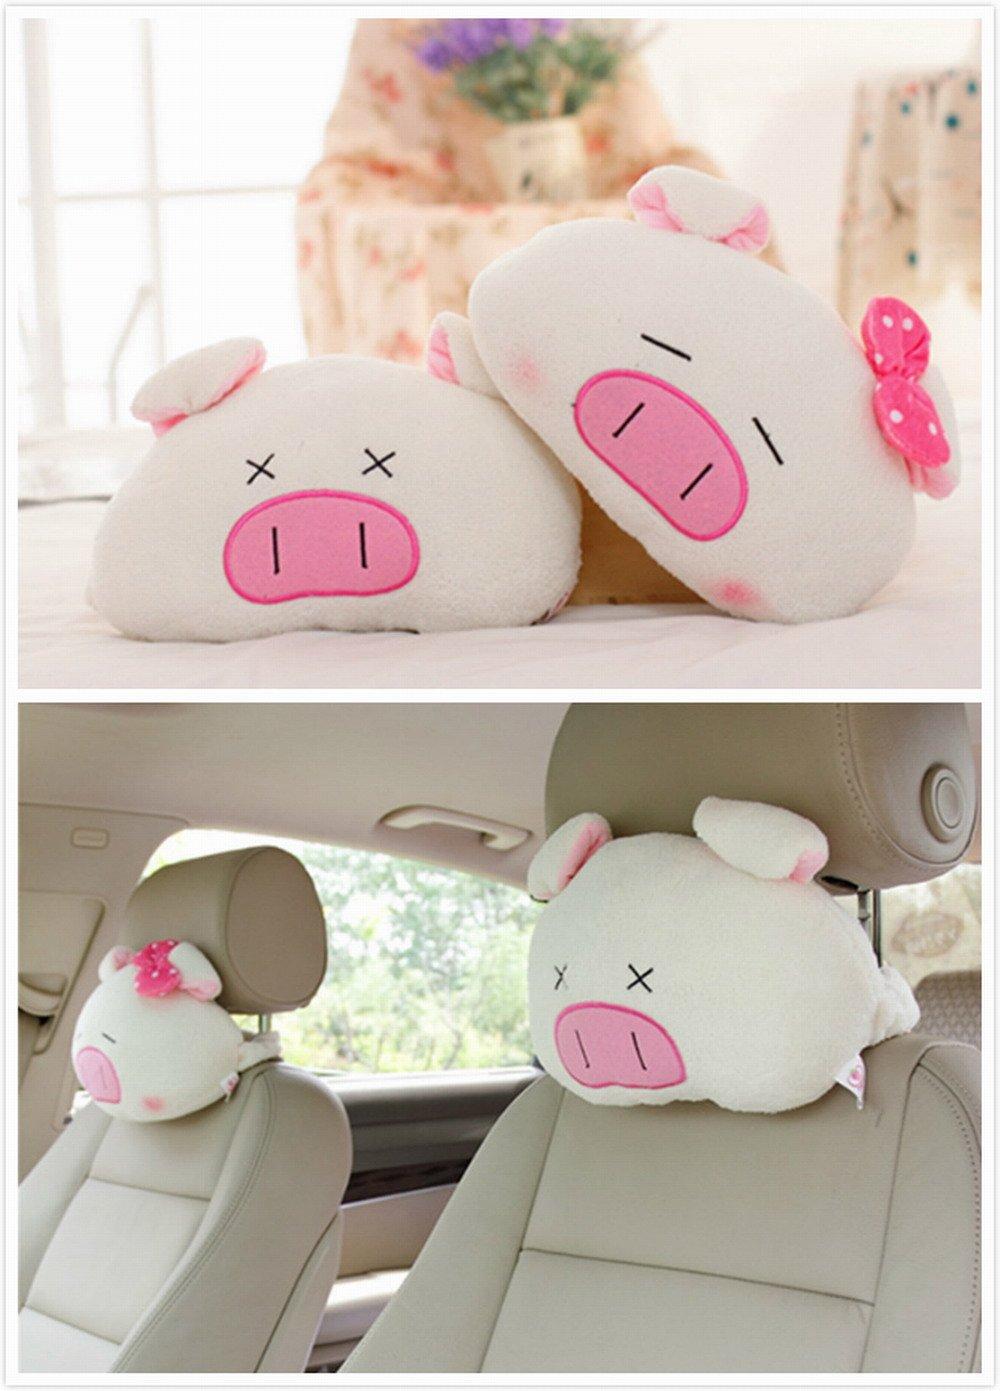 2pcs Cartoon Cute Styling Auto Car Plush Headrest Protect Neck Pillow Cartoon Travel Rest Pillow Cushion Pad by AMZ (Cartoon 01)